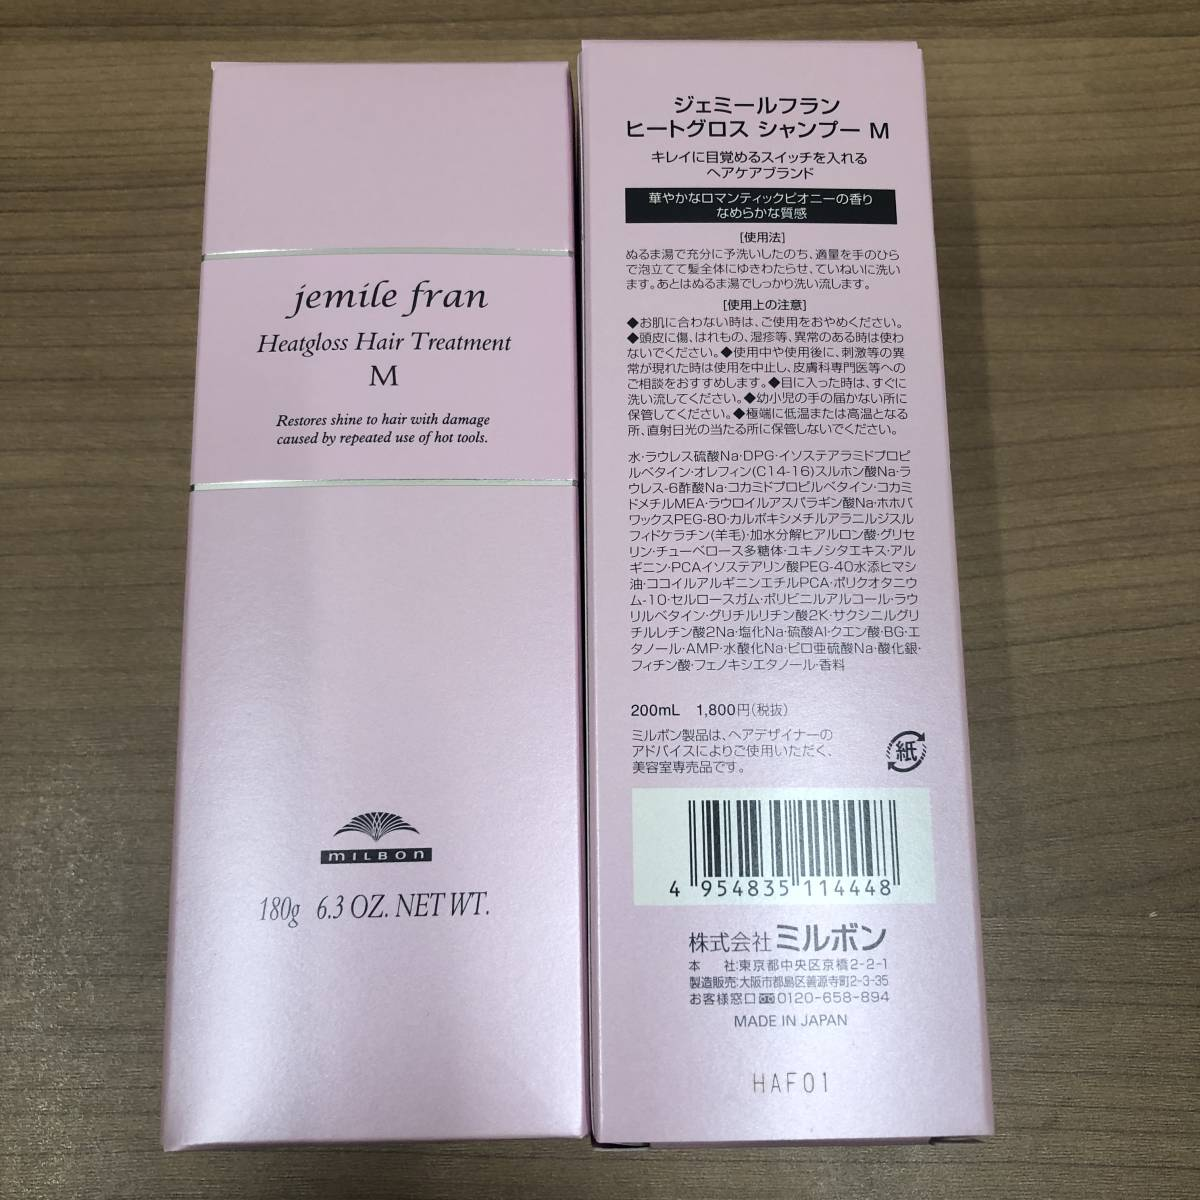 【MILBON/ミルボン】株主優待品 シャンプー/トリートメントセット★2839_画像2